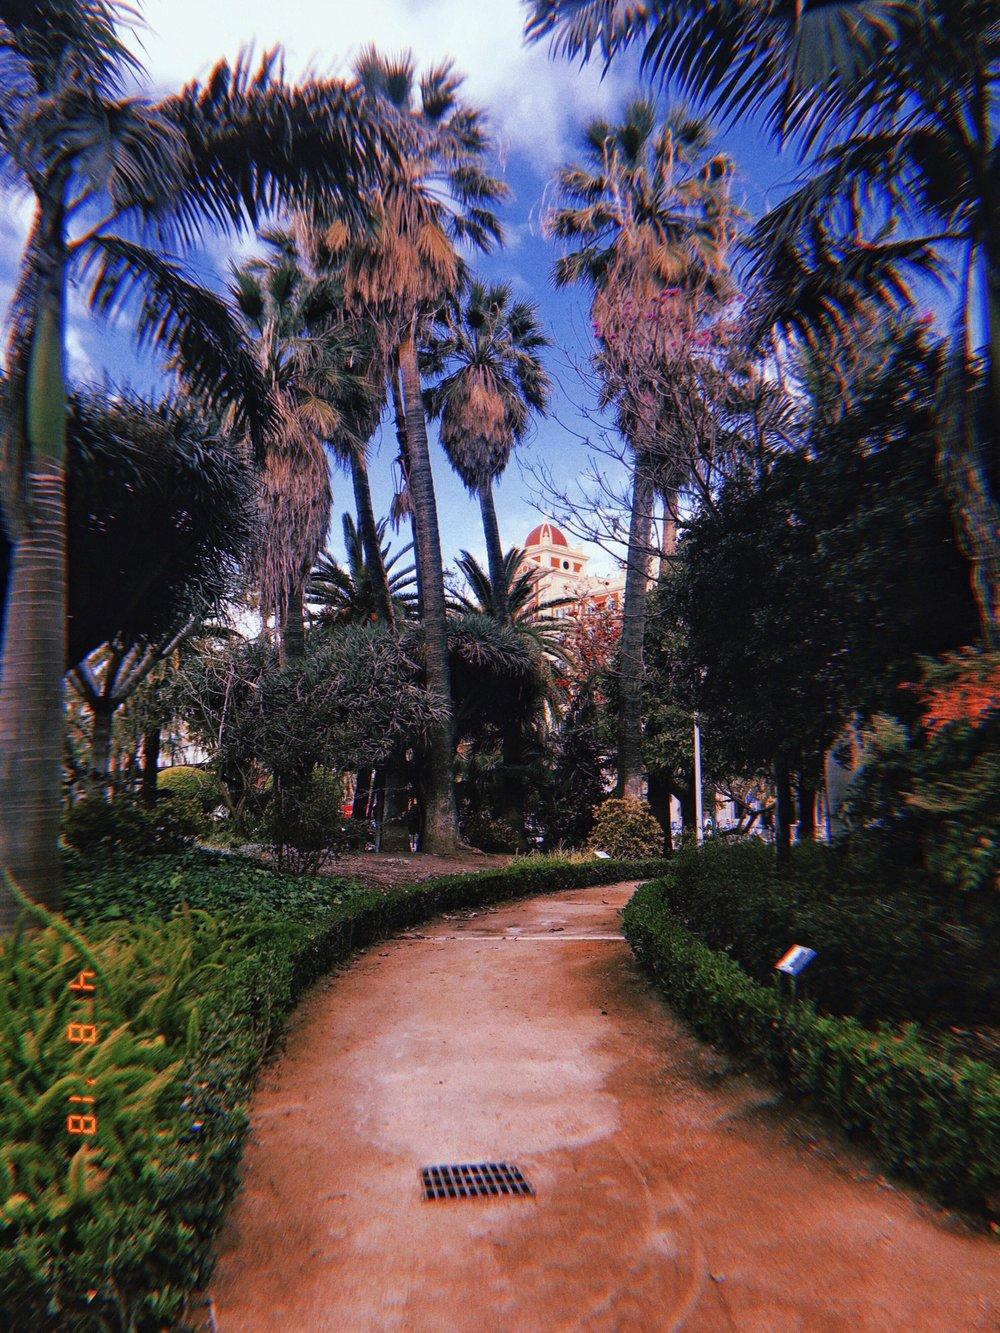 malaga_plants.jpg